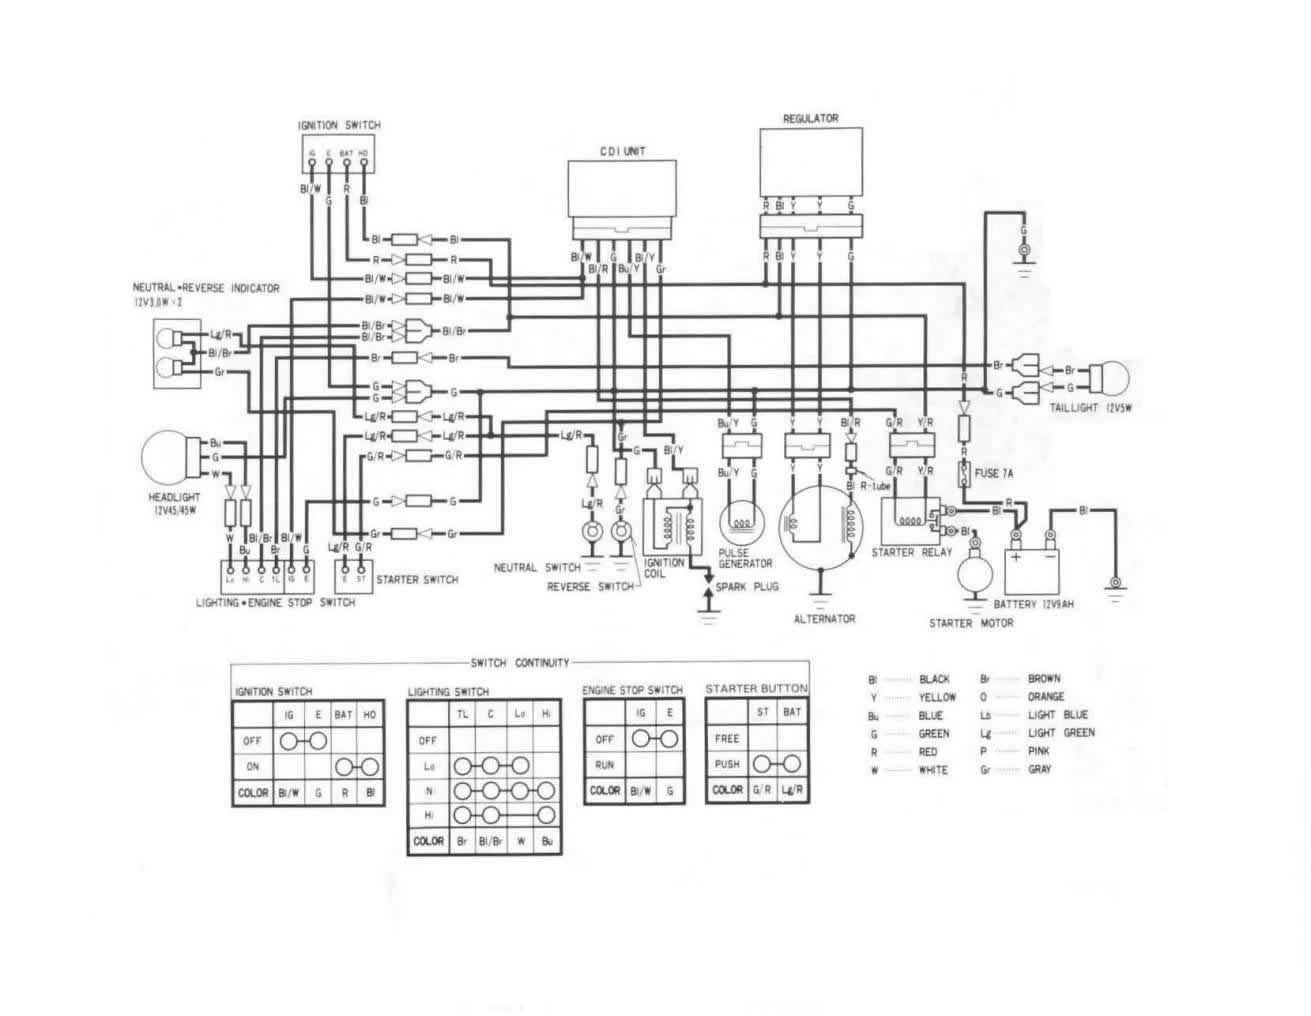 Diagram 1986 Honda Trx 125 Wiring Diagram Full Version Hd Quality Wiring Diagram Eardiagram Cpn Valdejuine Fr